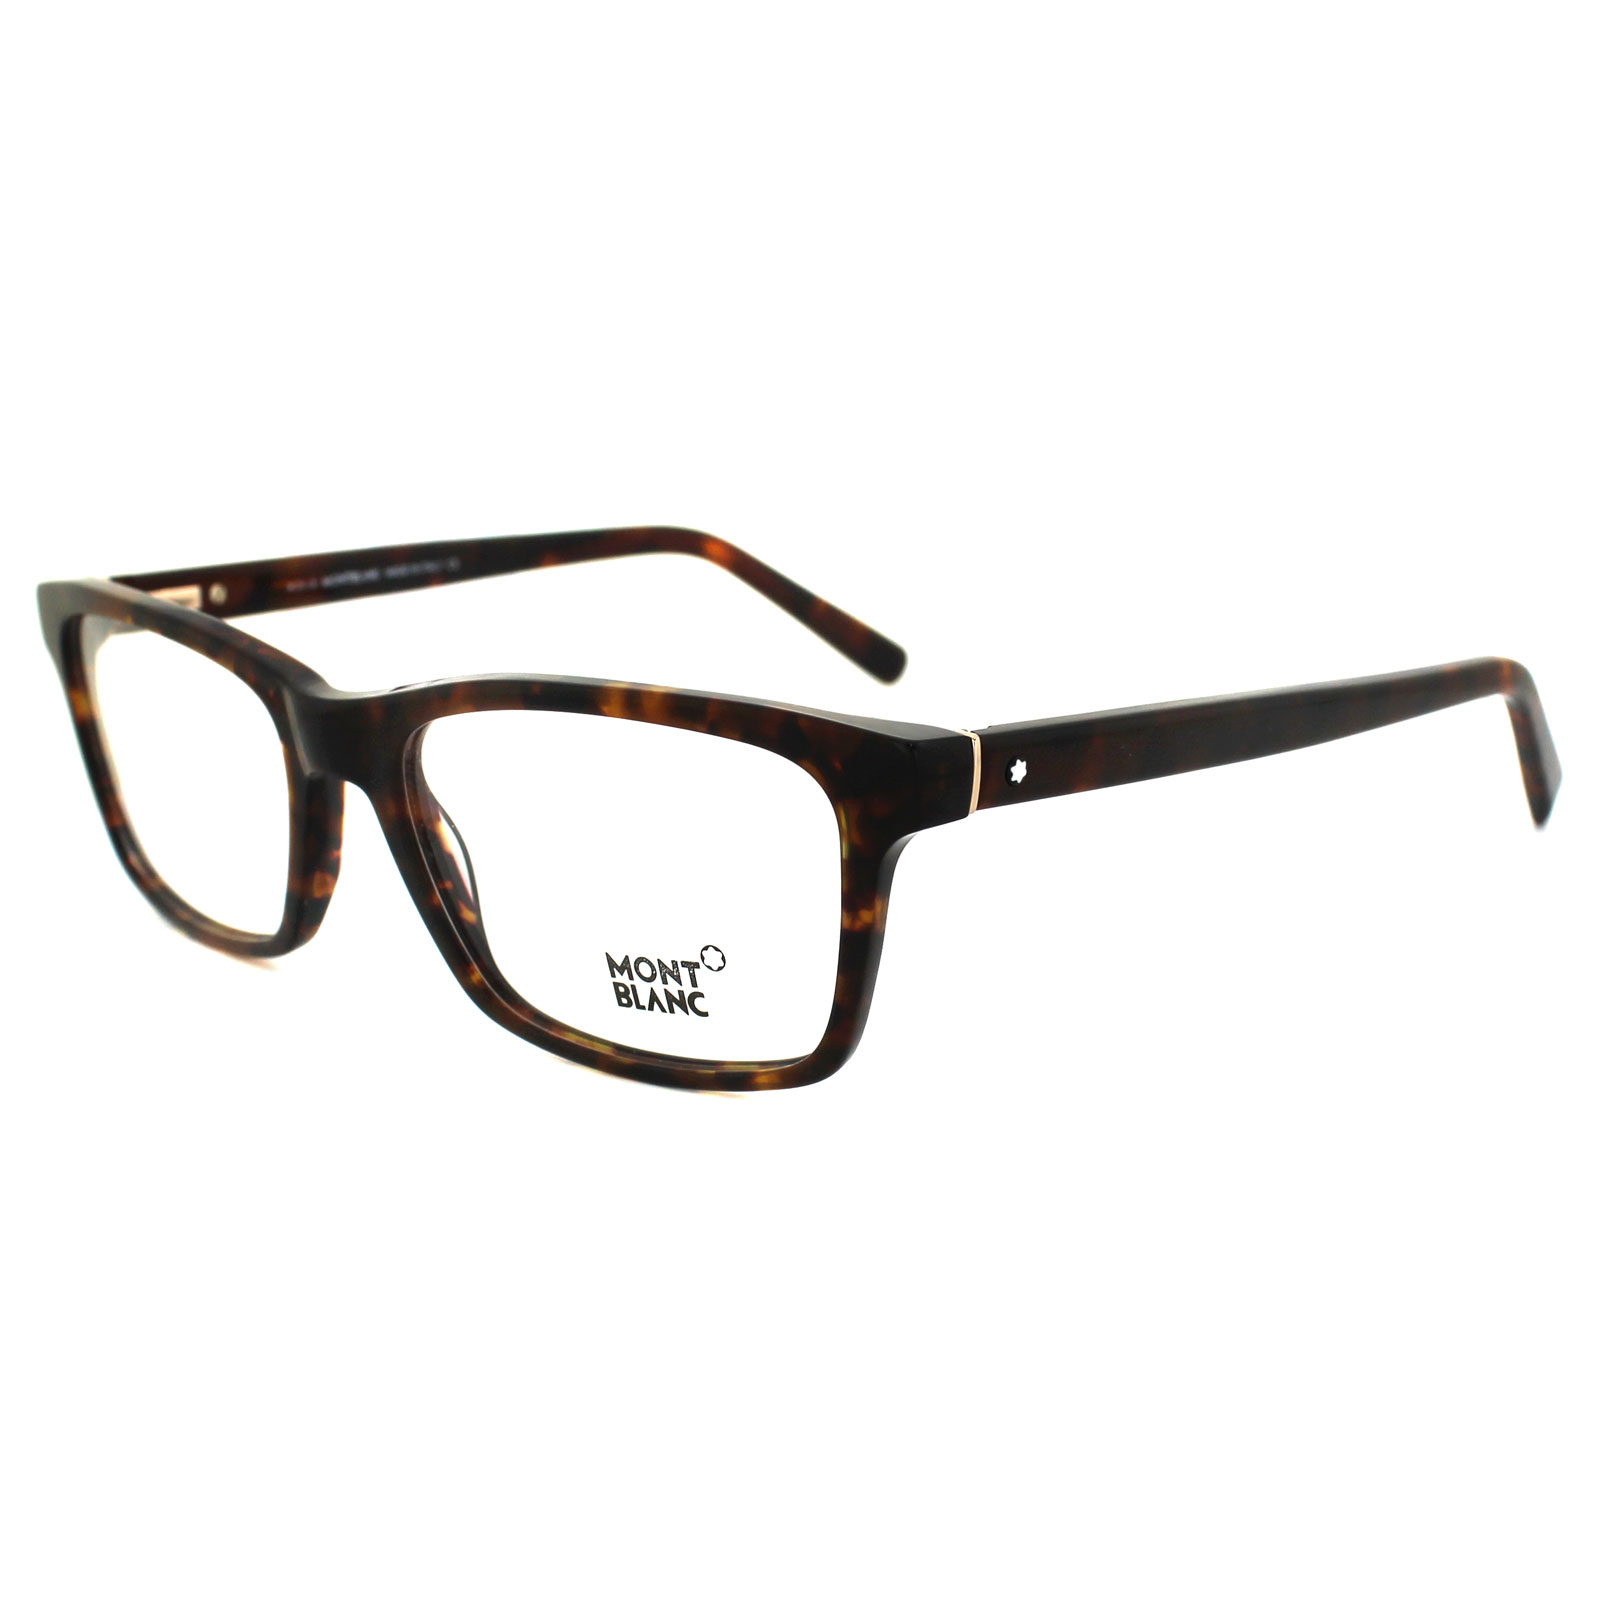 mont blanc glasses frames mb0541 056